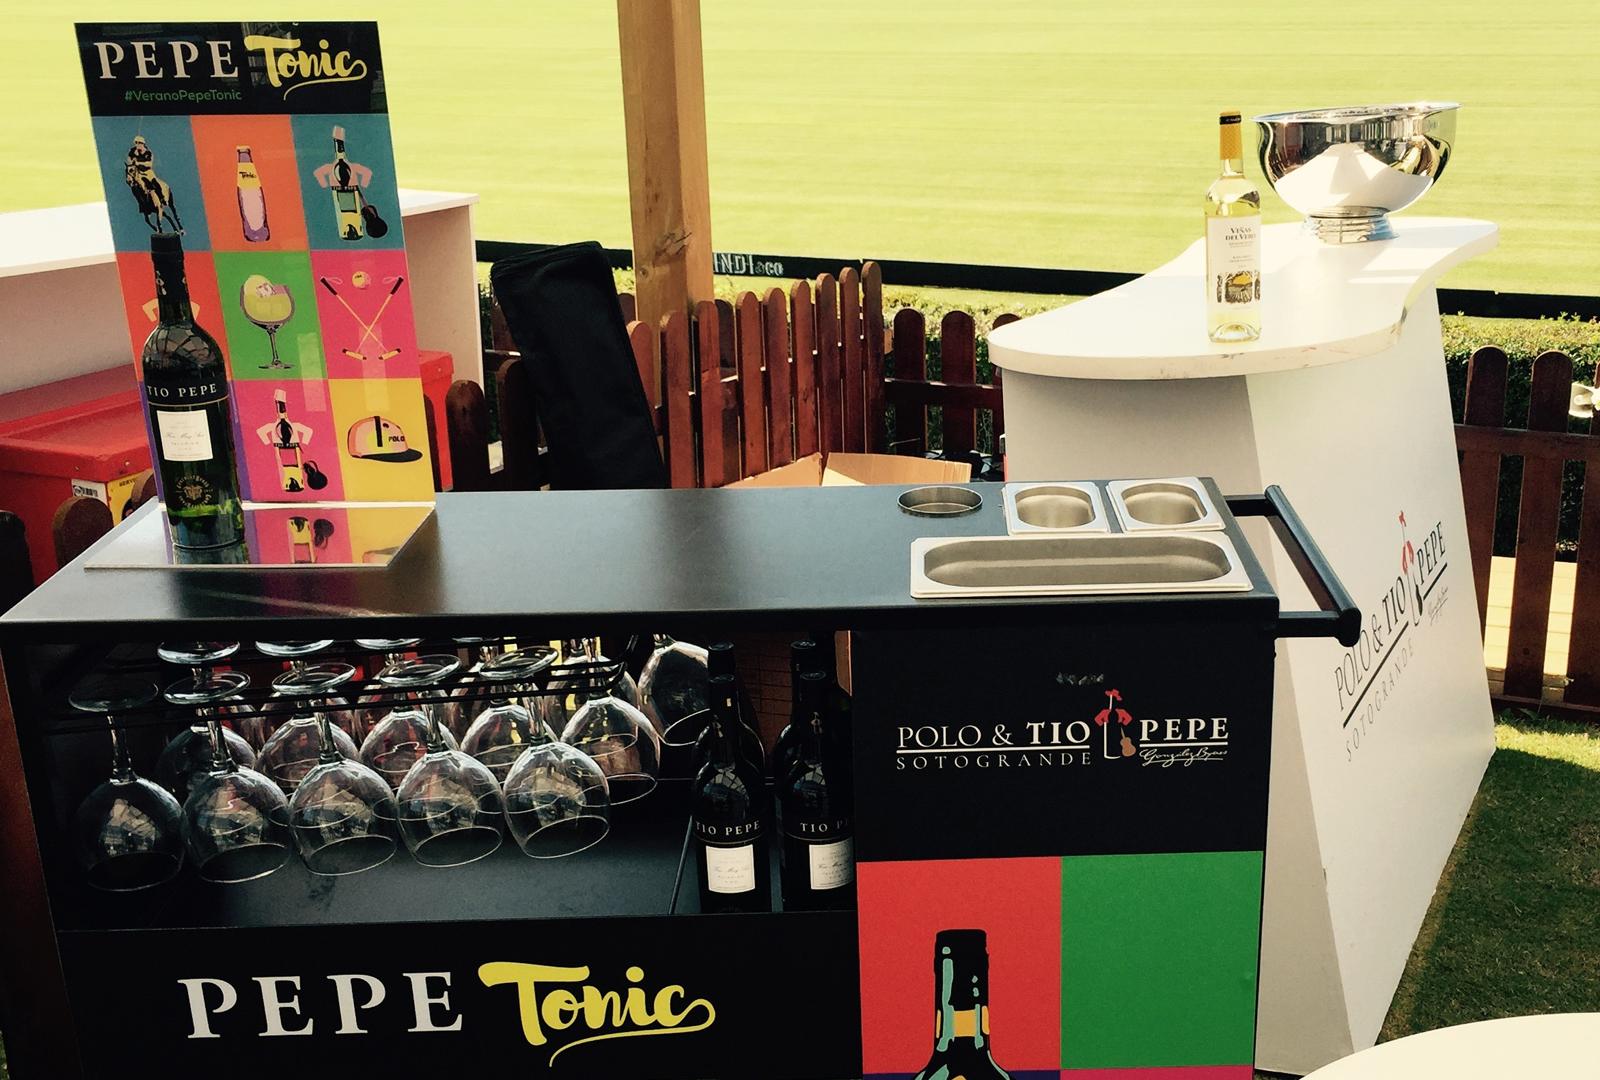 Tío Pepe vino oficial del Torneo Polo Club Sotogrande.